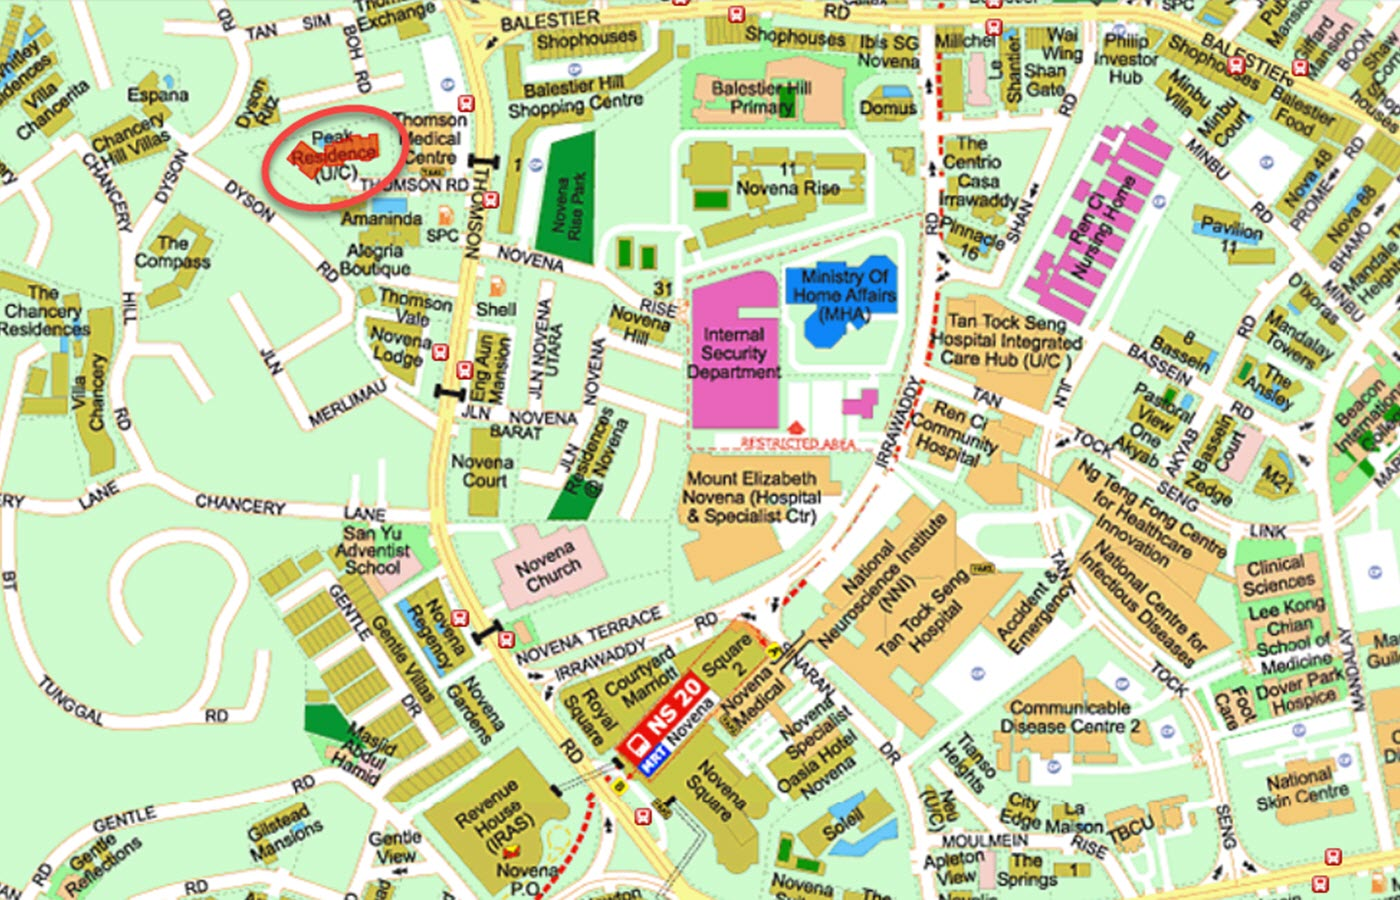 Peak Residence Condo Location - Street Directory Map